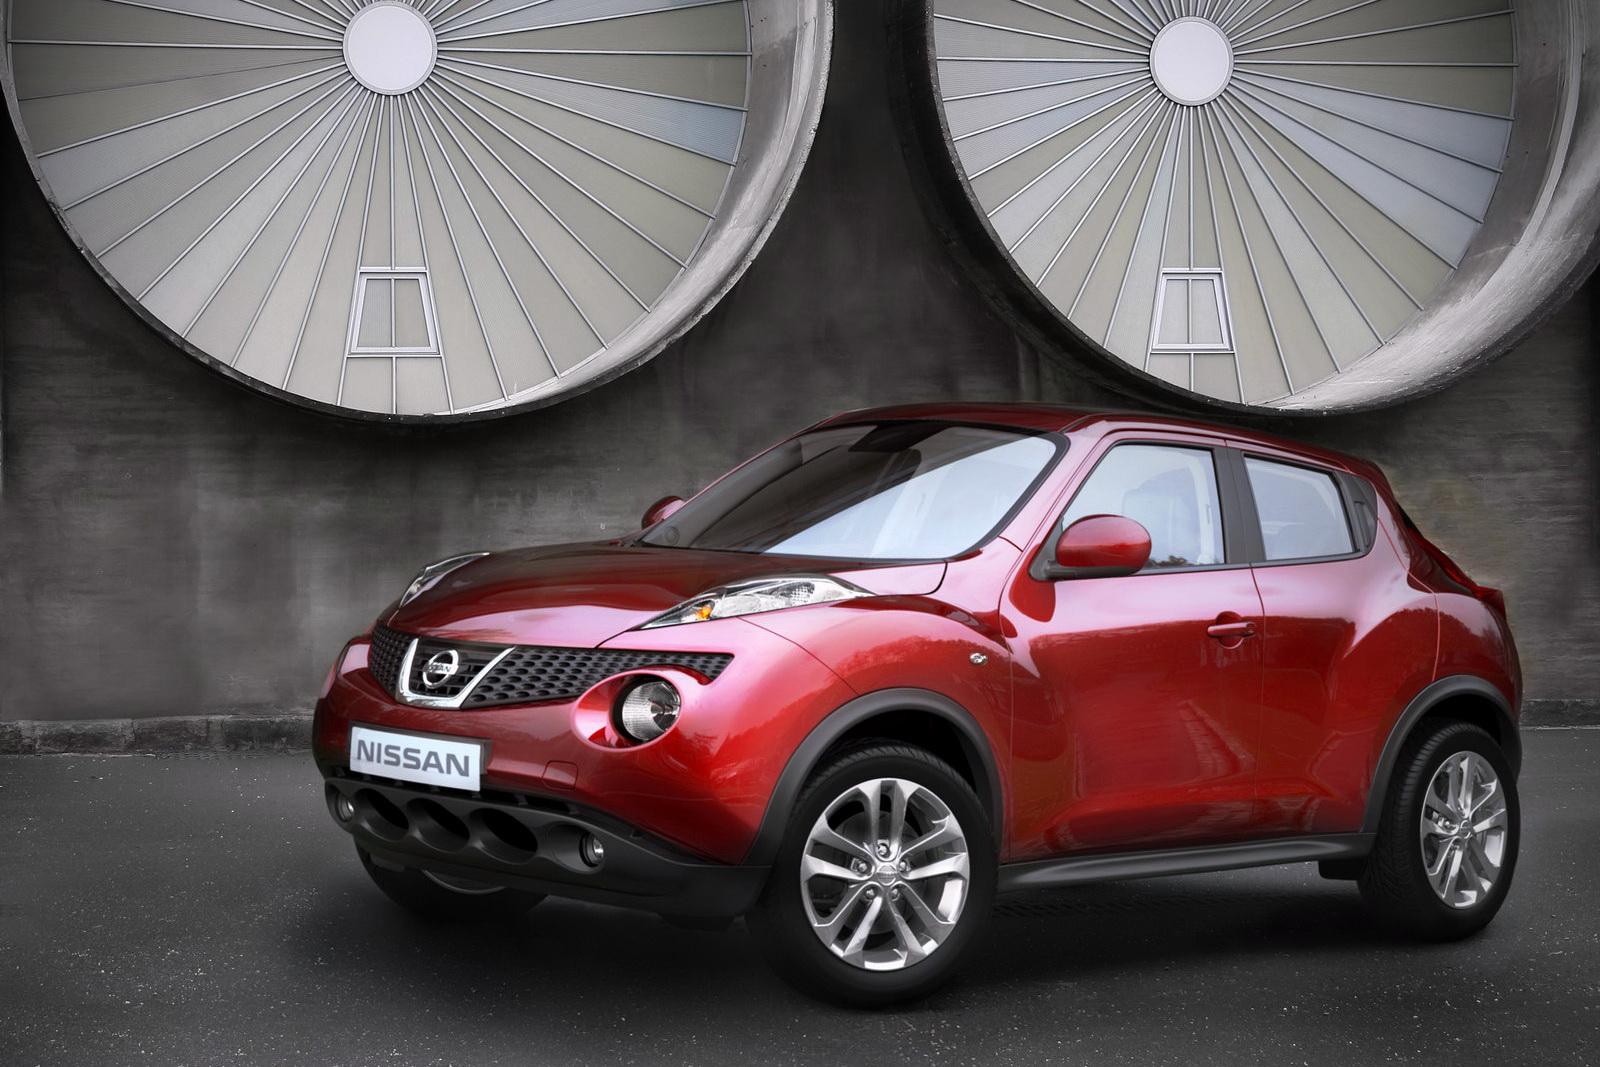 Фотографии Nissan Juke Фотография #2 Фото Nissan Juke.